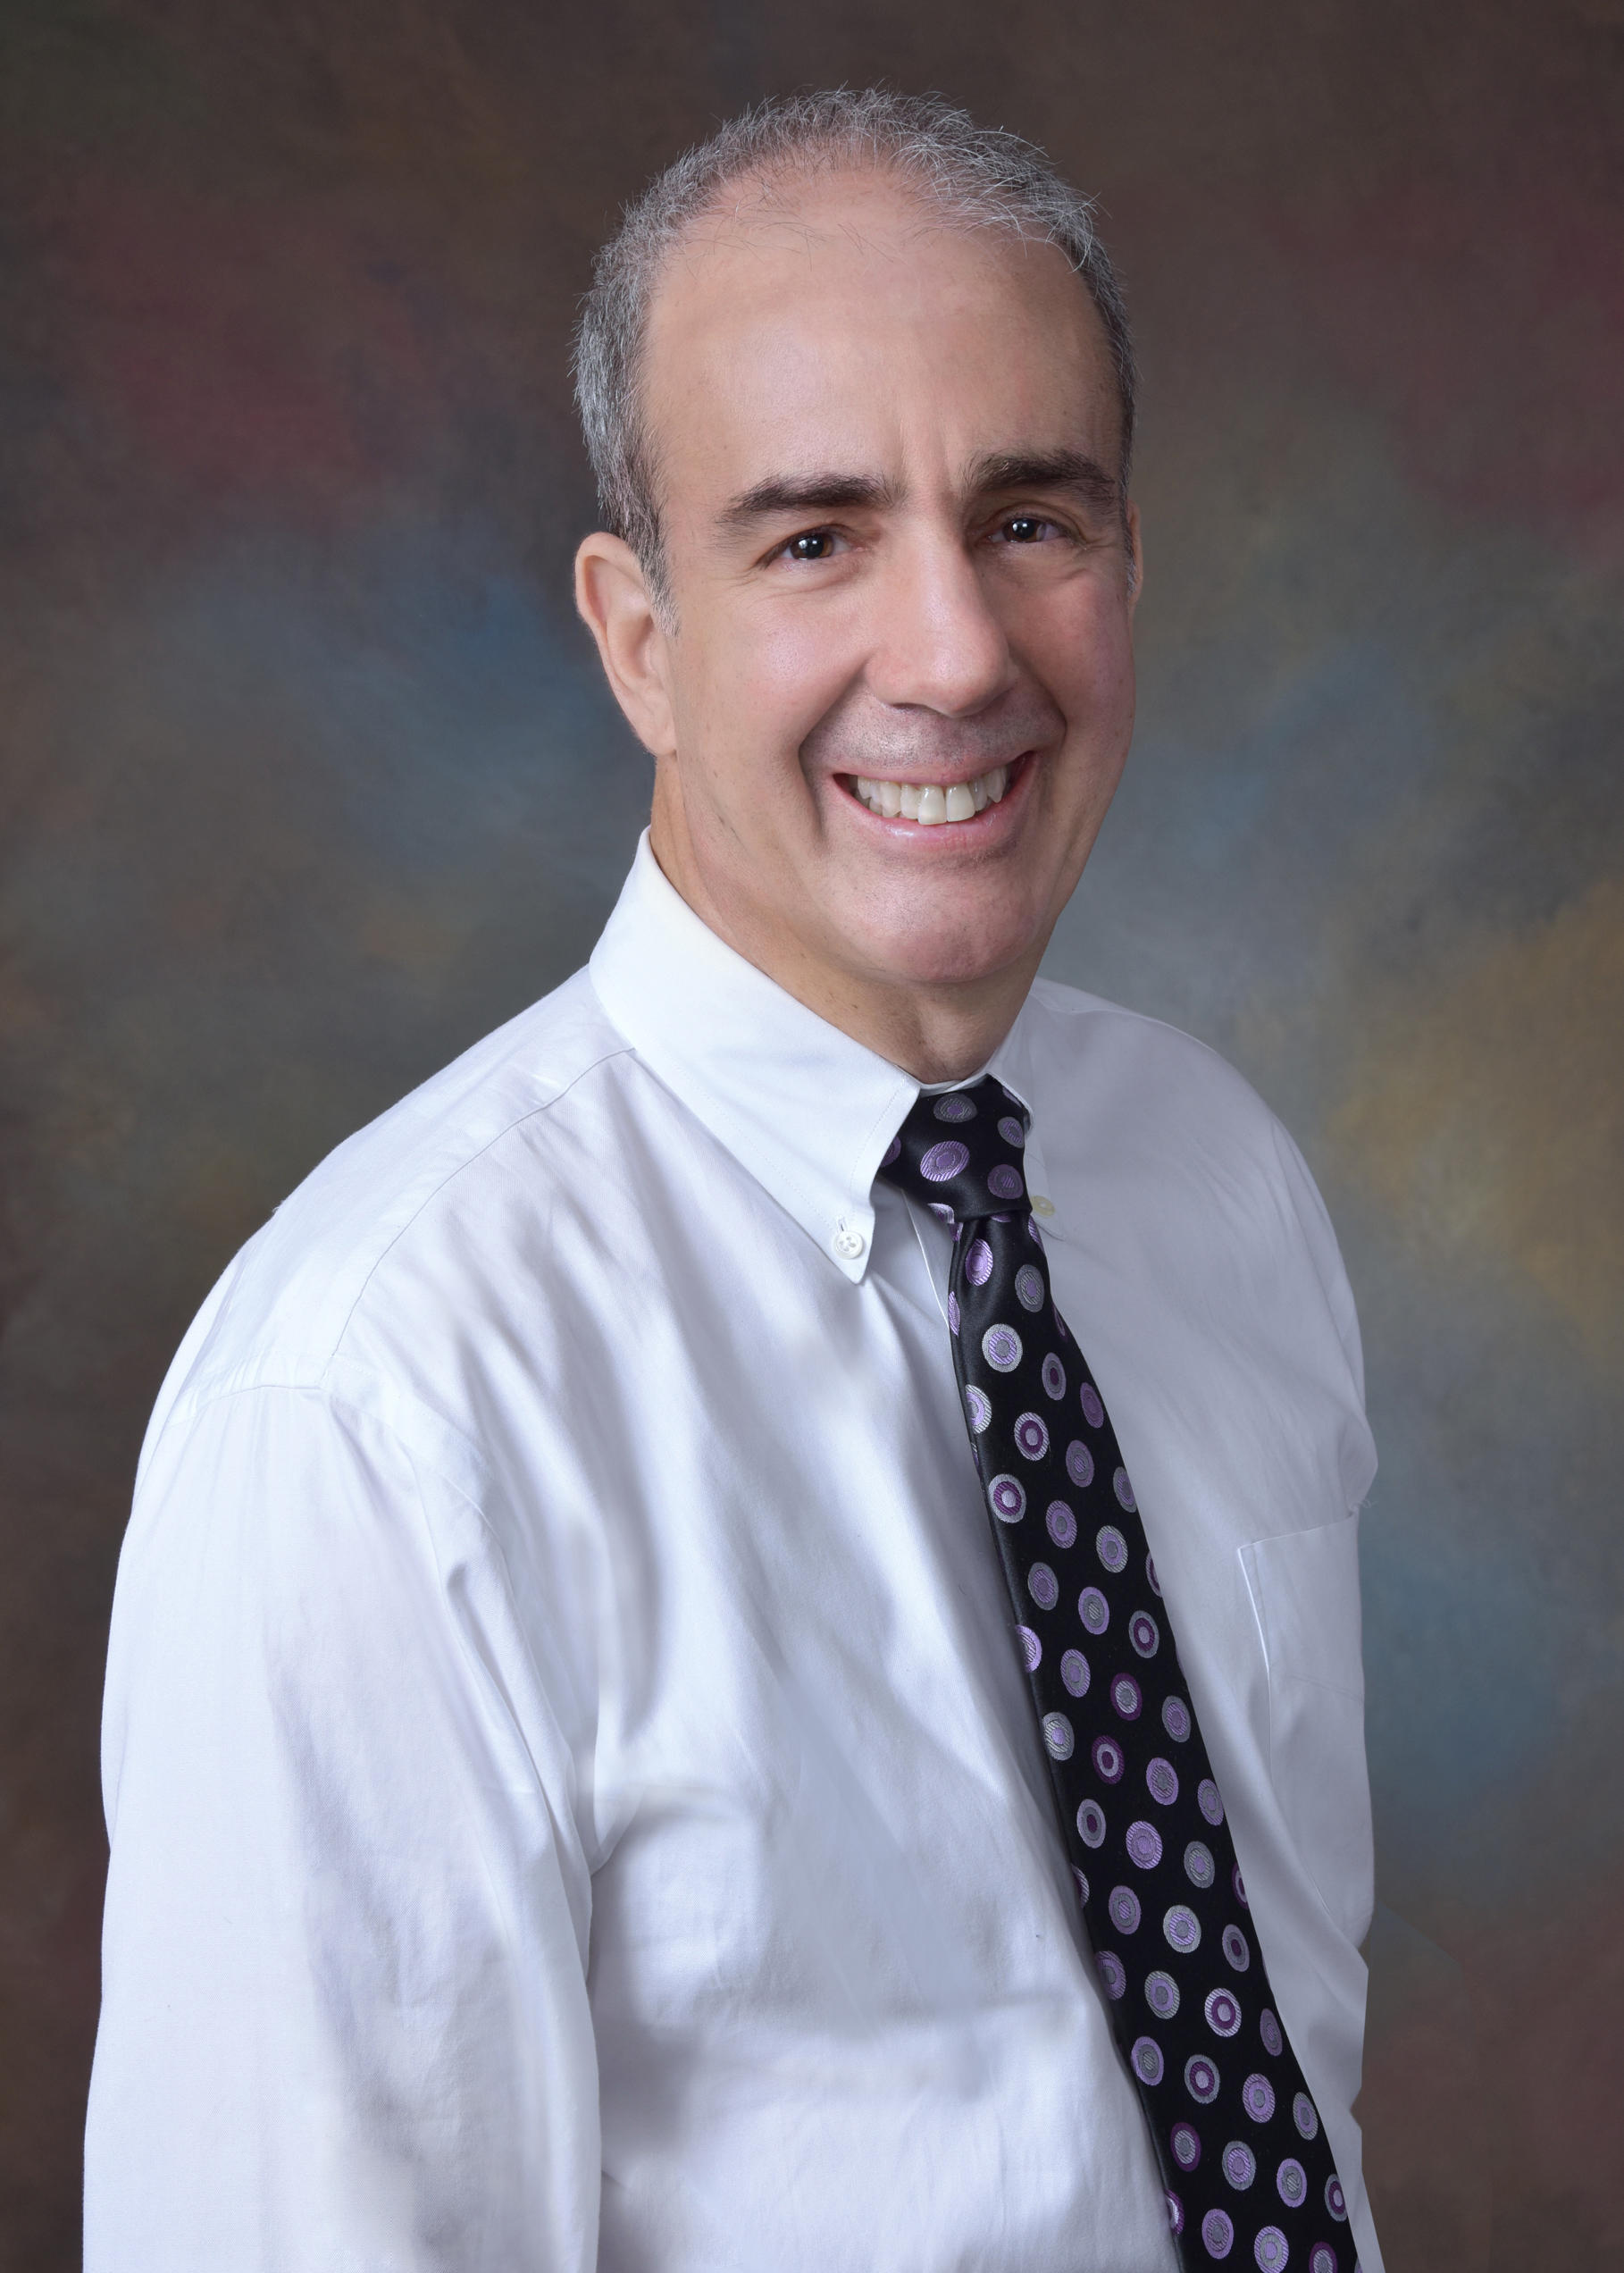 David Arbit, MD